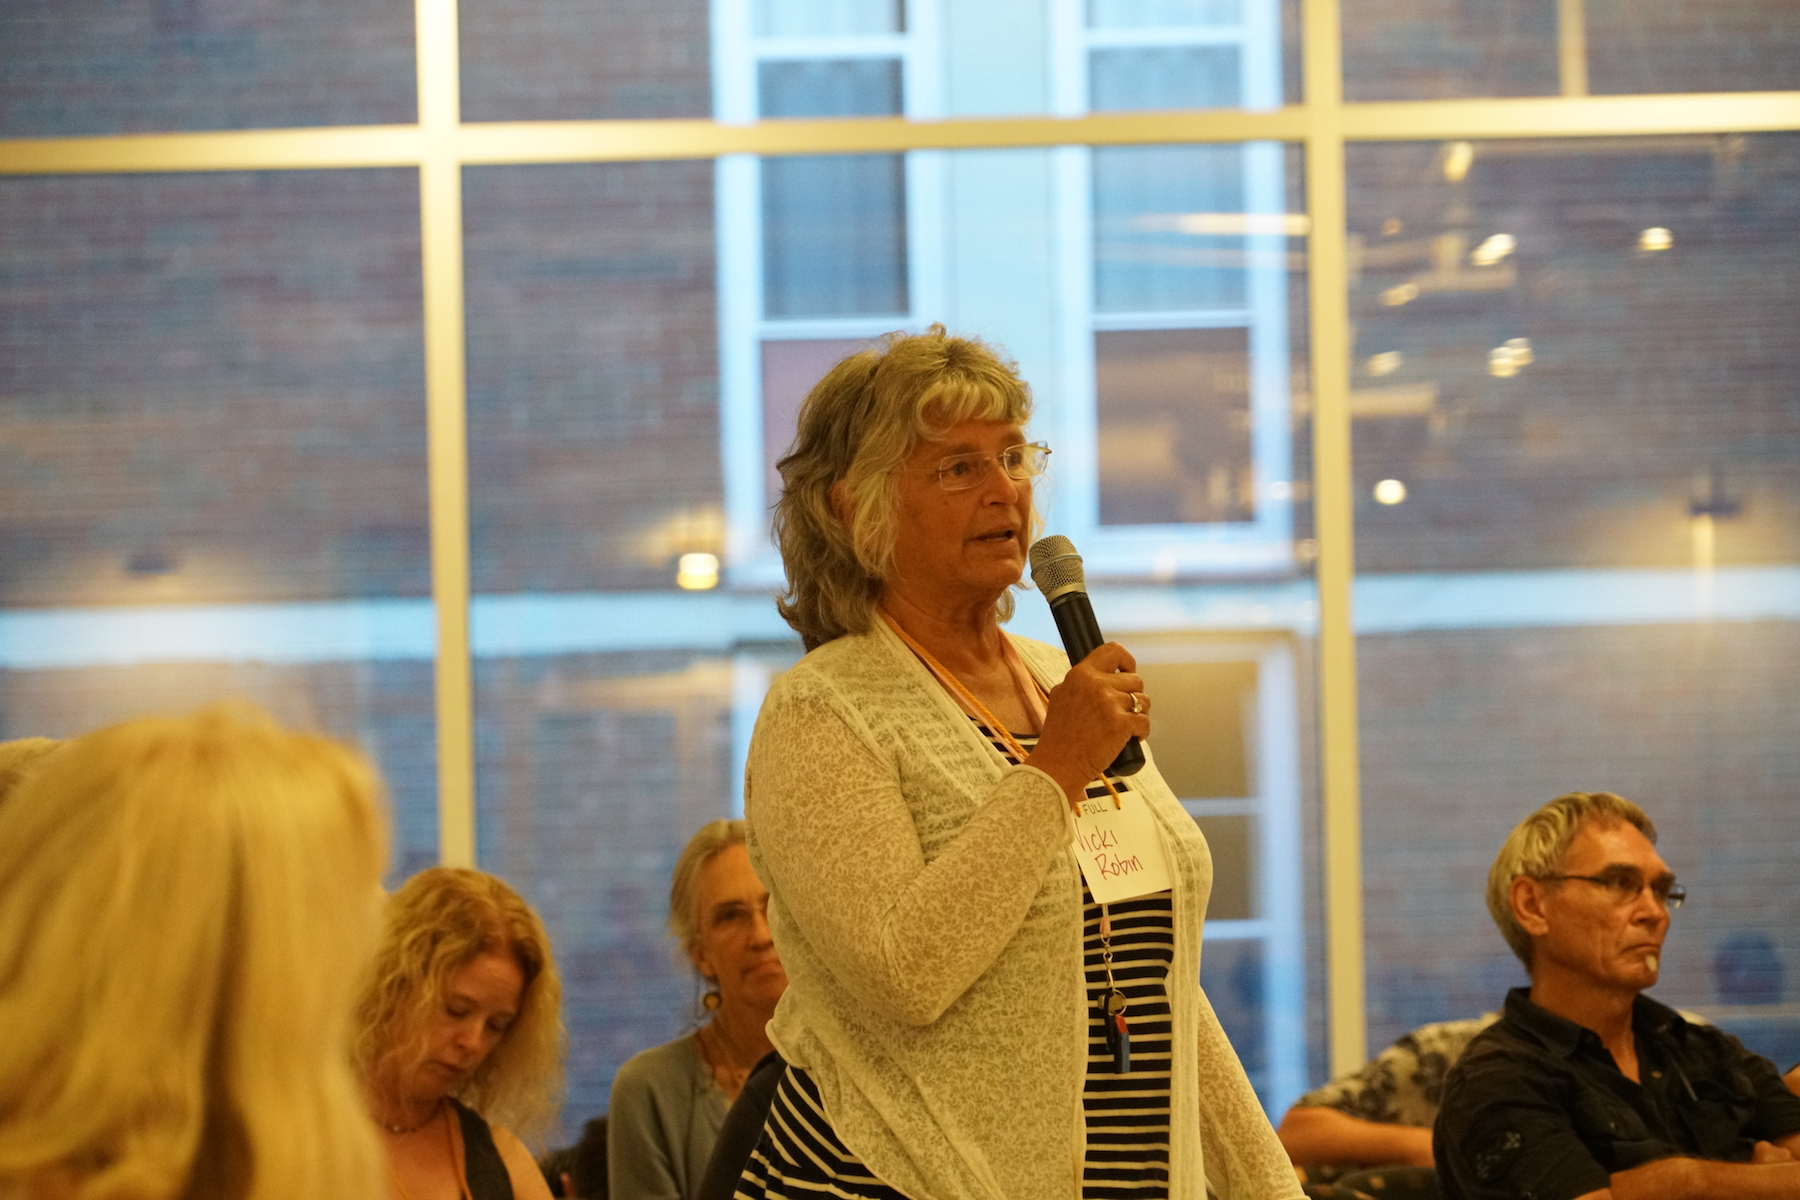 Transition superstar Vicki Robin asks a question of keynote speaker Richard Heinberg during the Q&A portion of his presentation. Photo by Teresa Konechne.